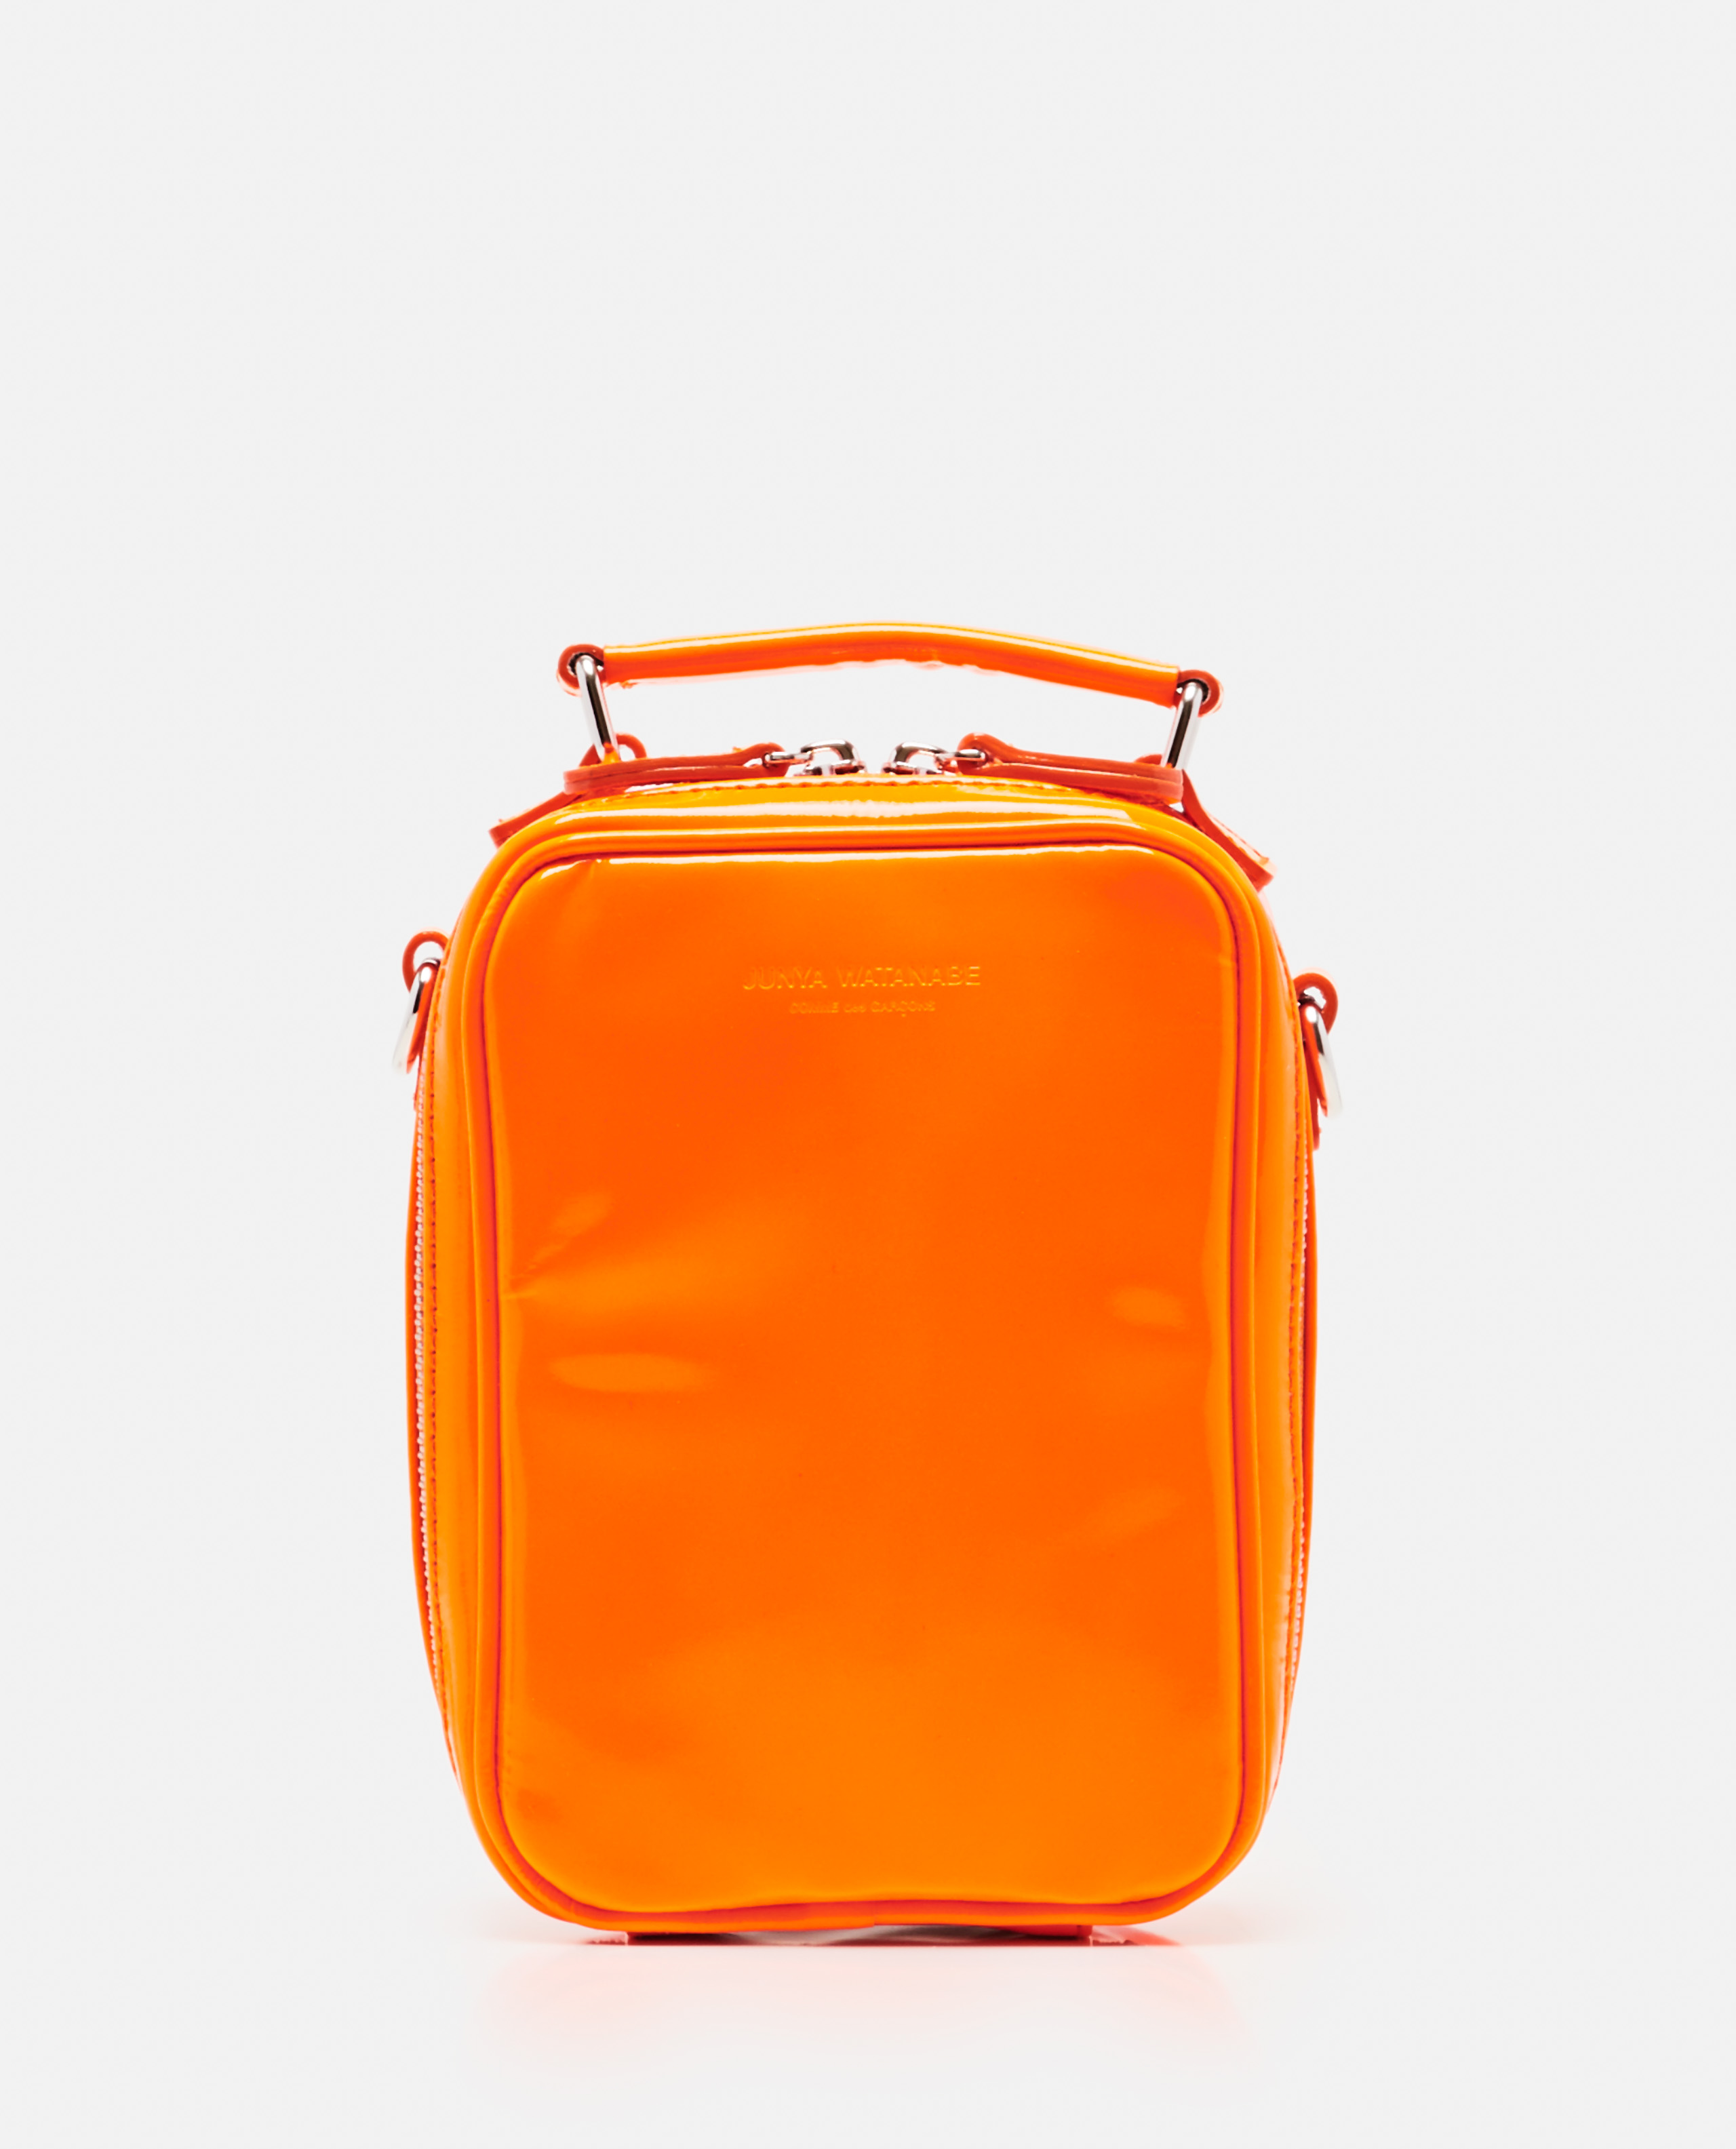 Small bag with handle